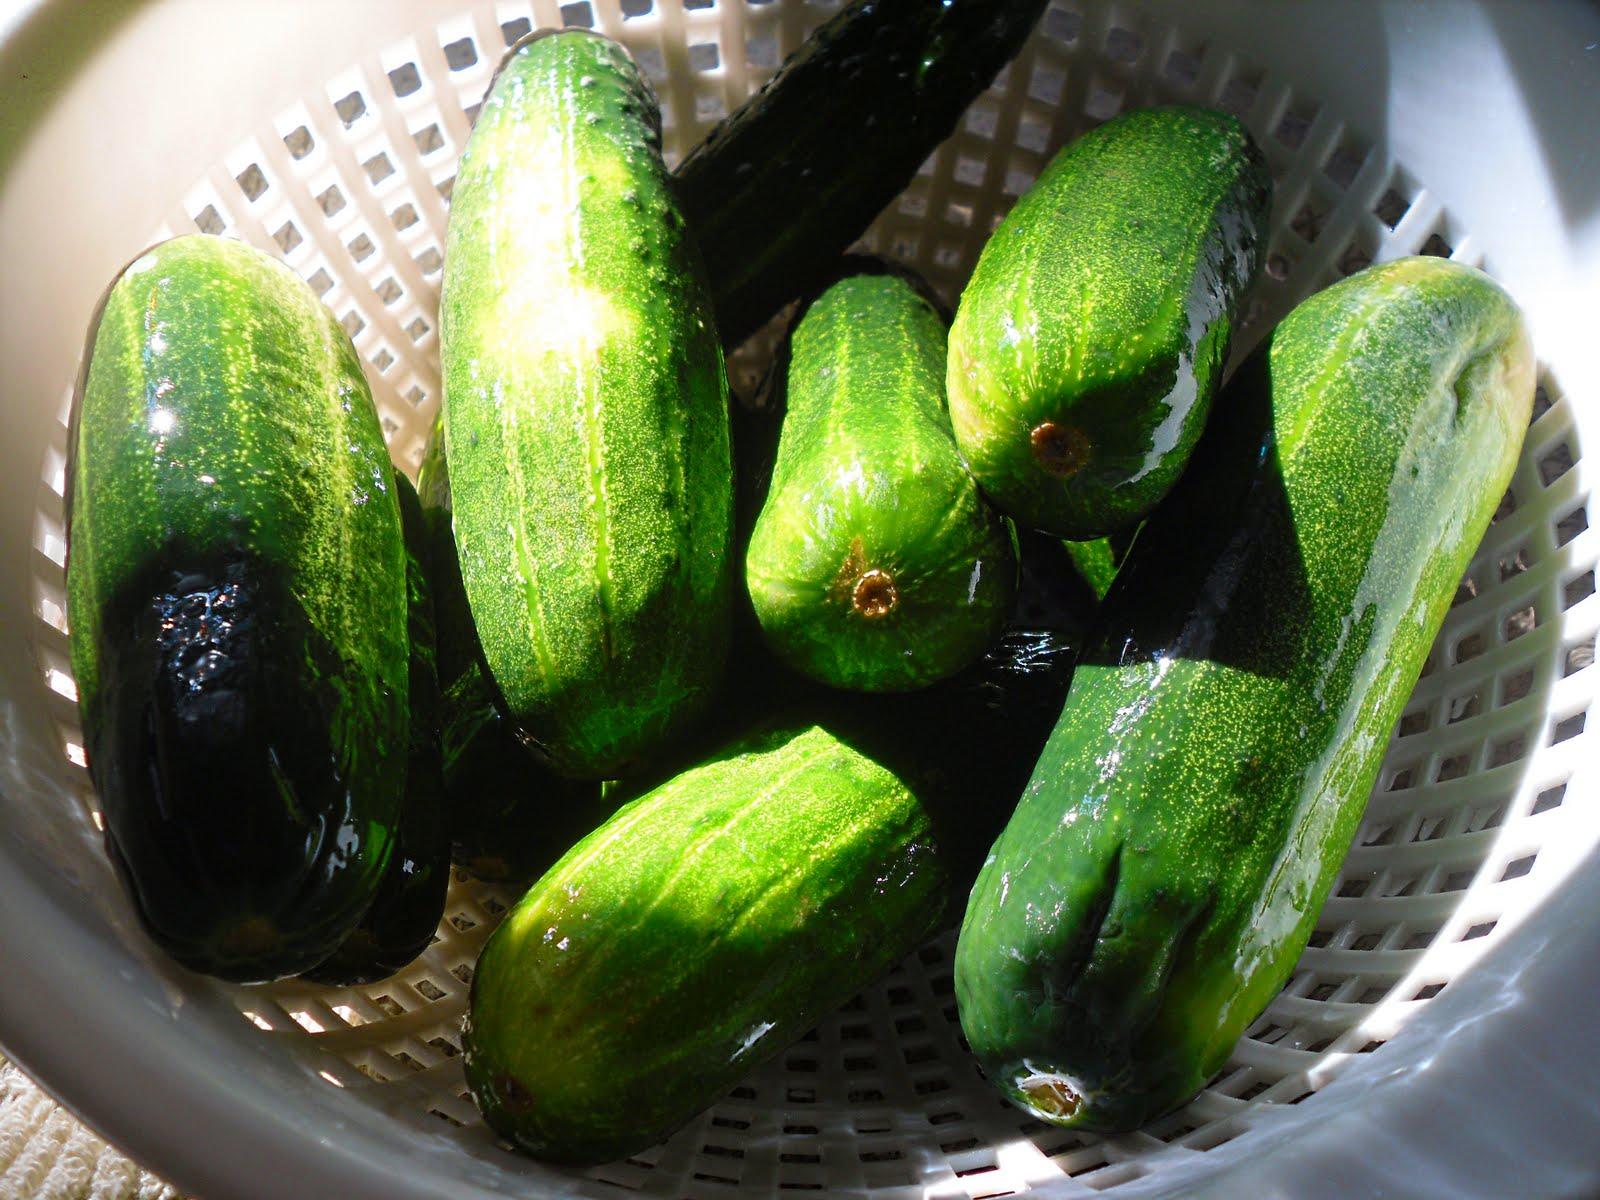 Comfy Cuisine: Quick Garlic Dill Pickles